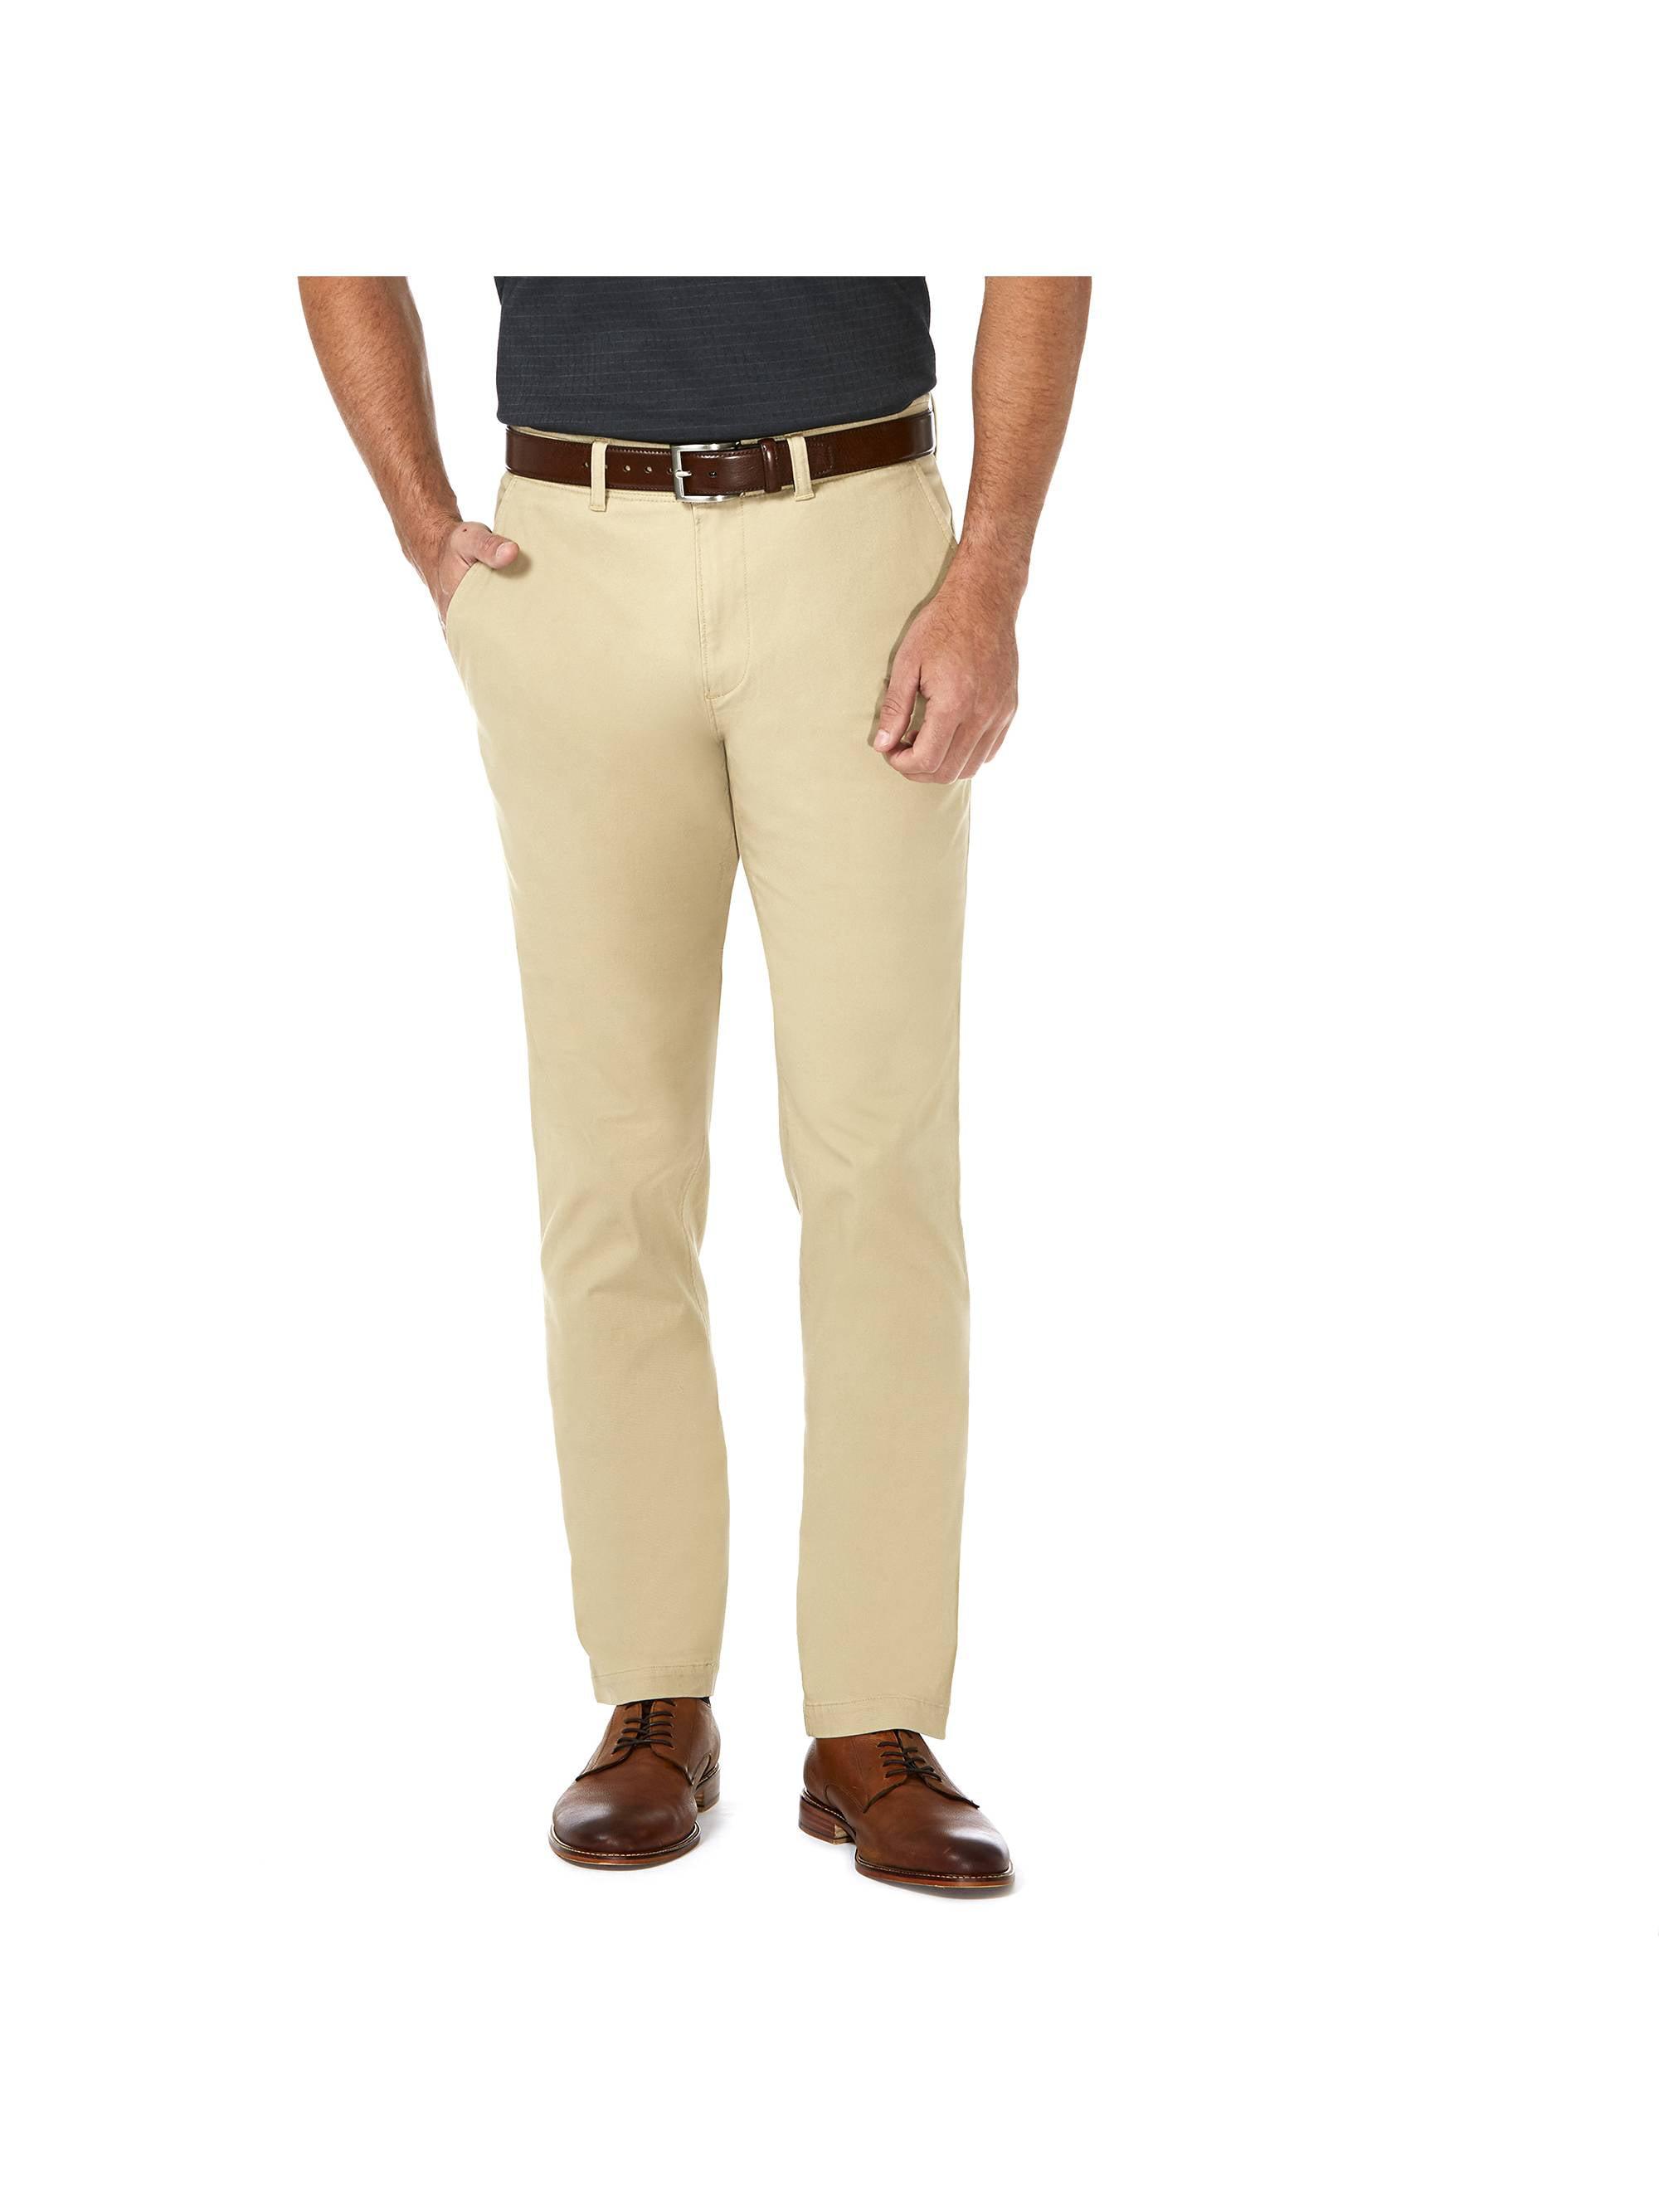 Men's Coastal Comfort Flat Front Chino Pant Slim Fit HC00222